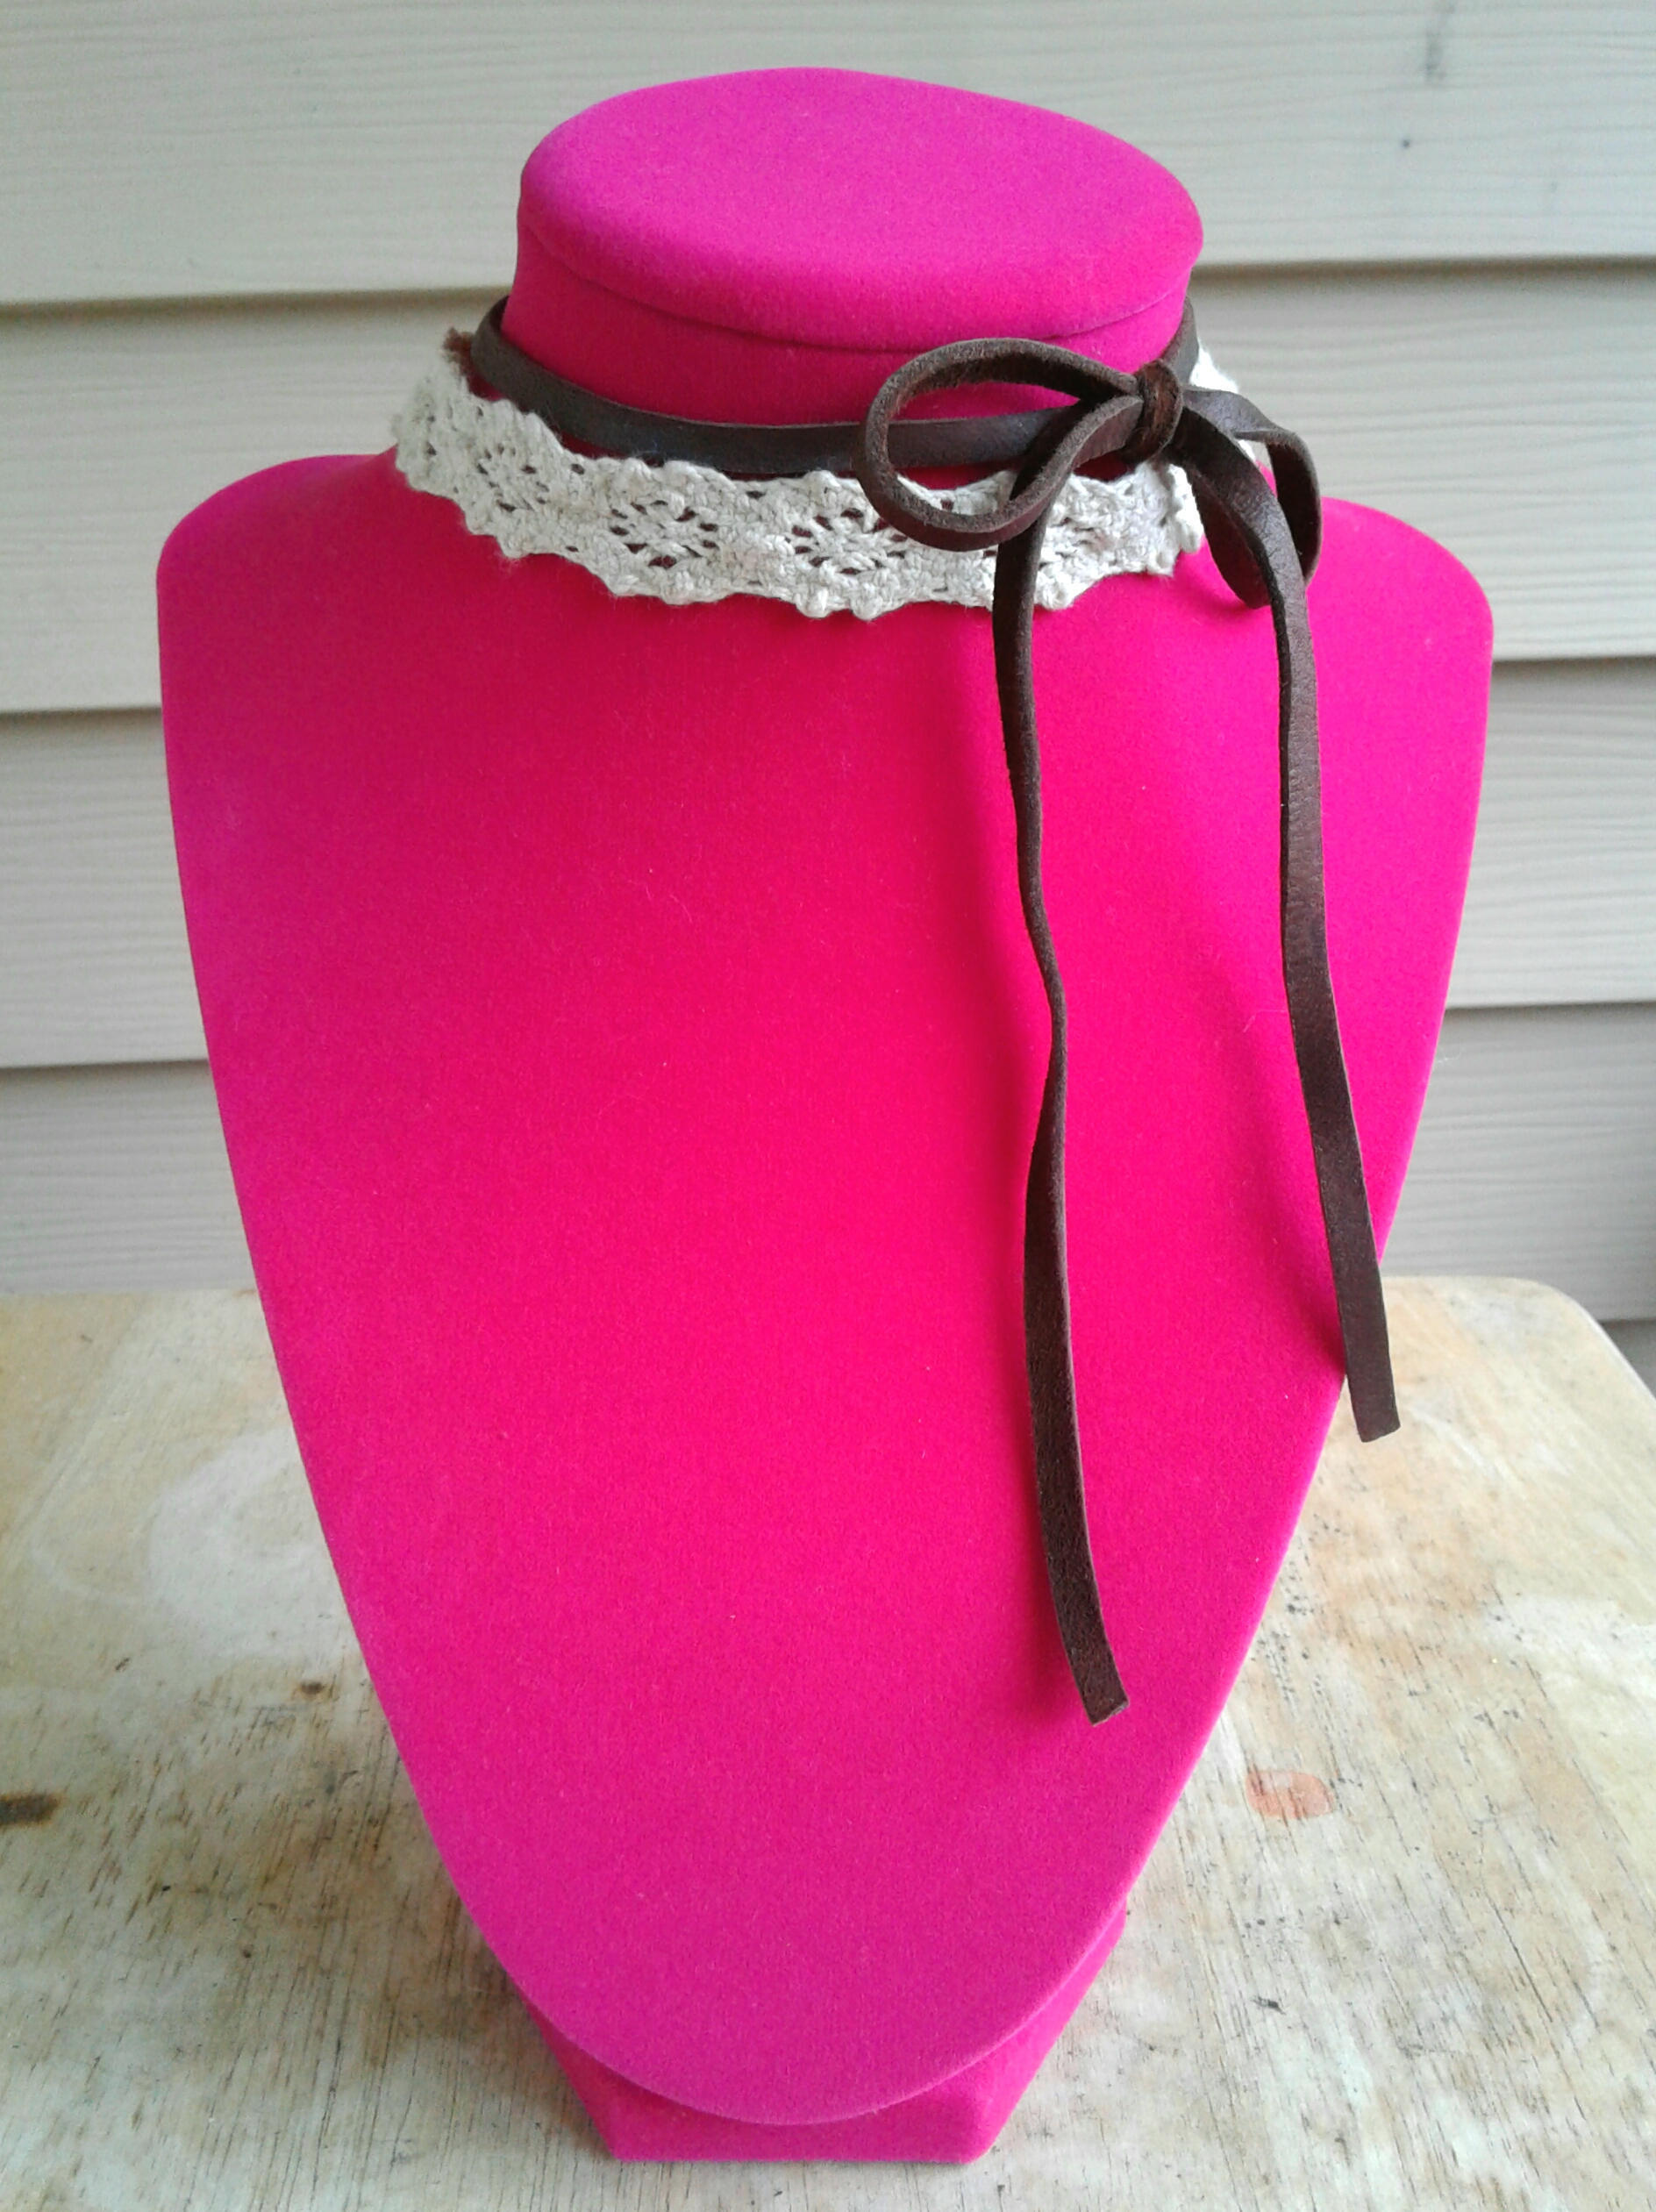 Layered Brown Leather Bow Choker And White Ivory Lace Choker Layered Choker  Necklaces Women s Chokers Layered 9273bdd803